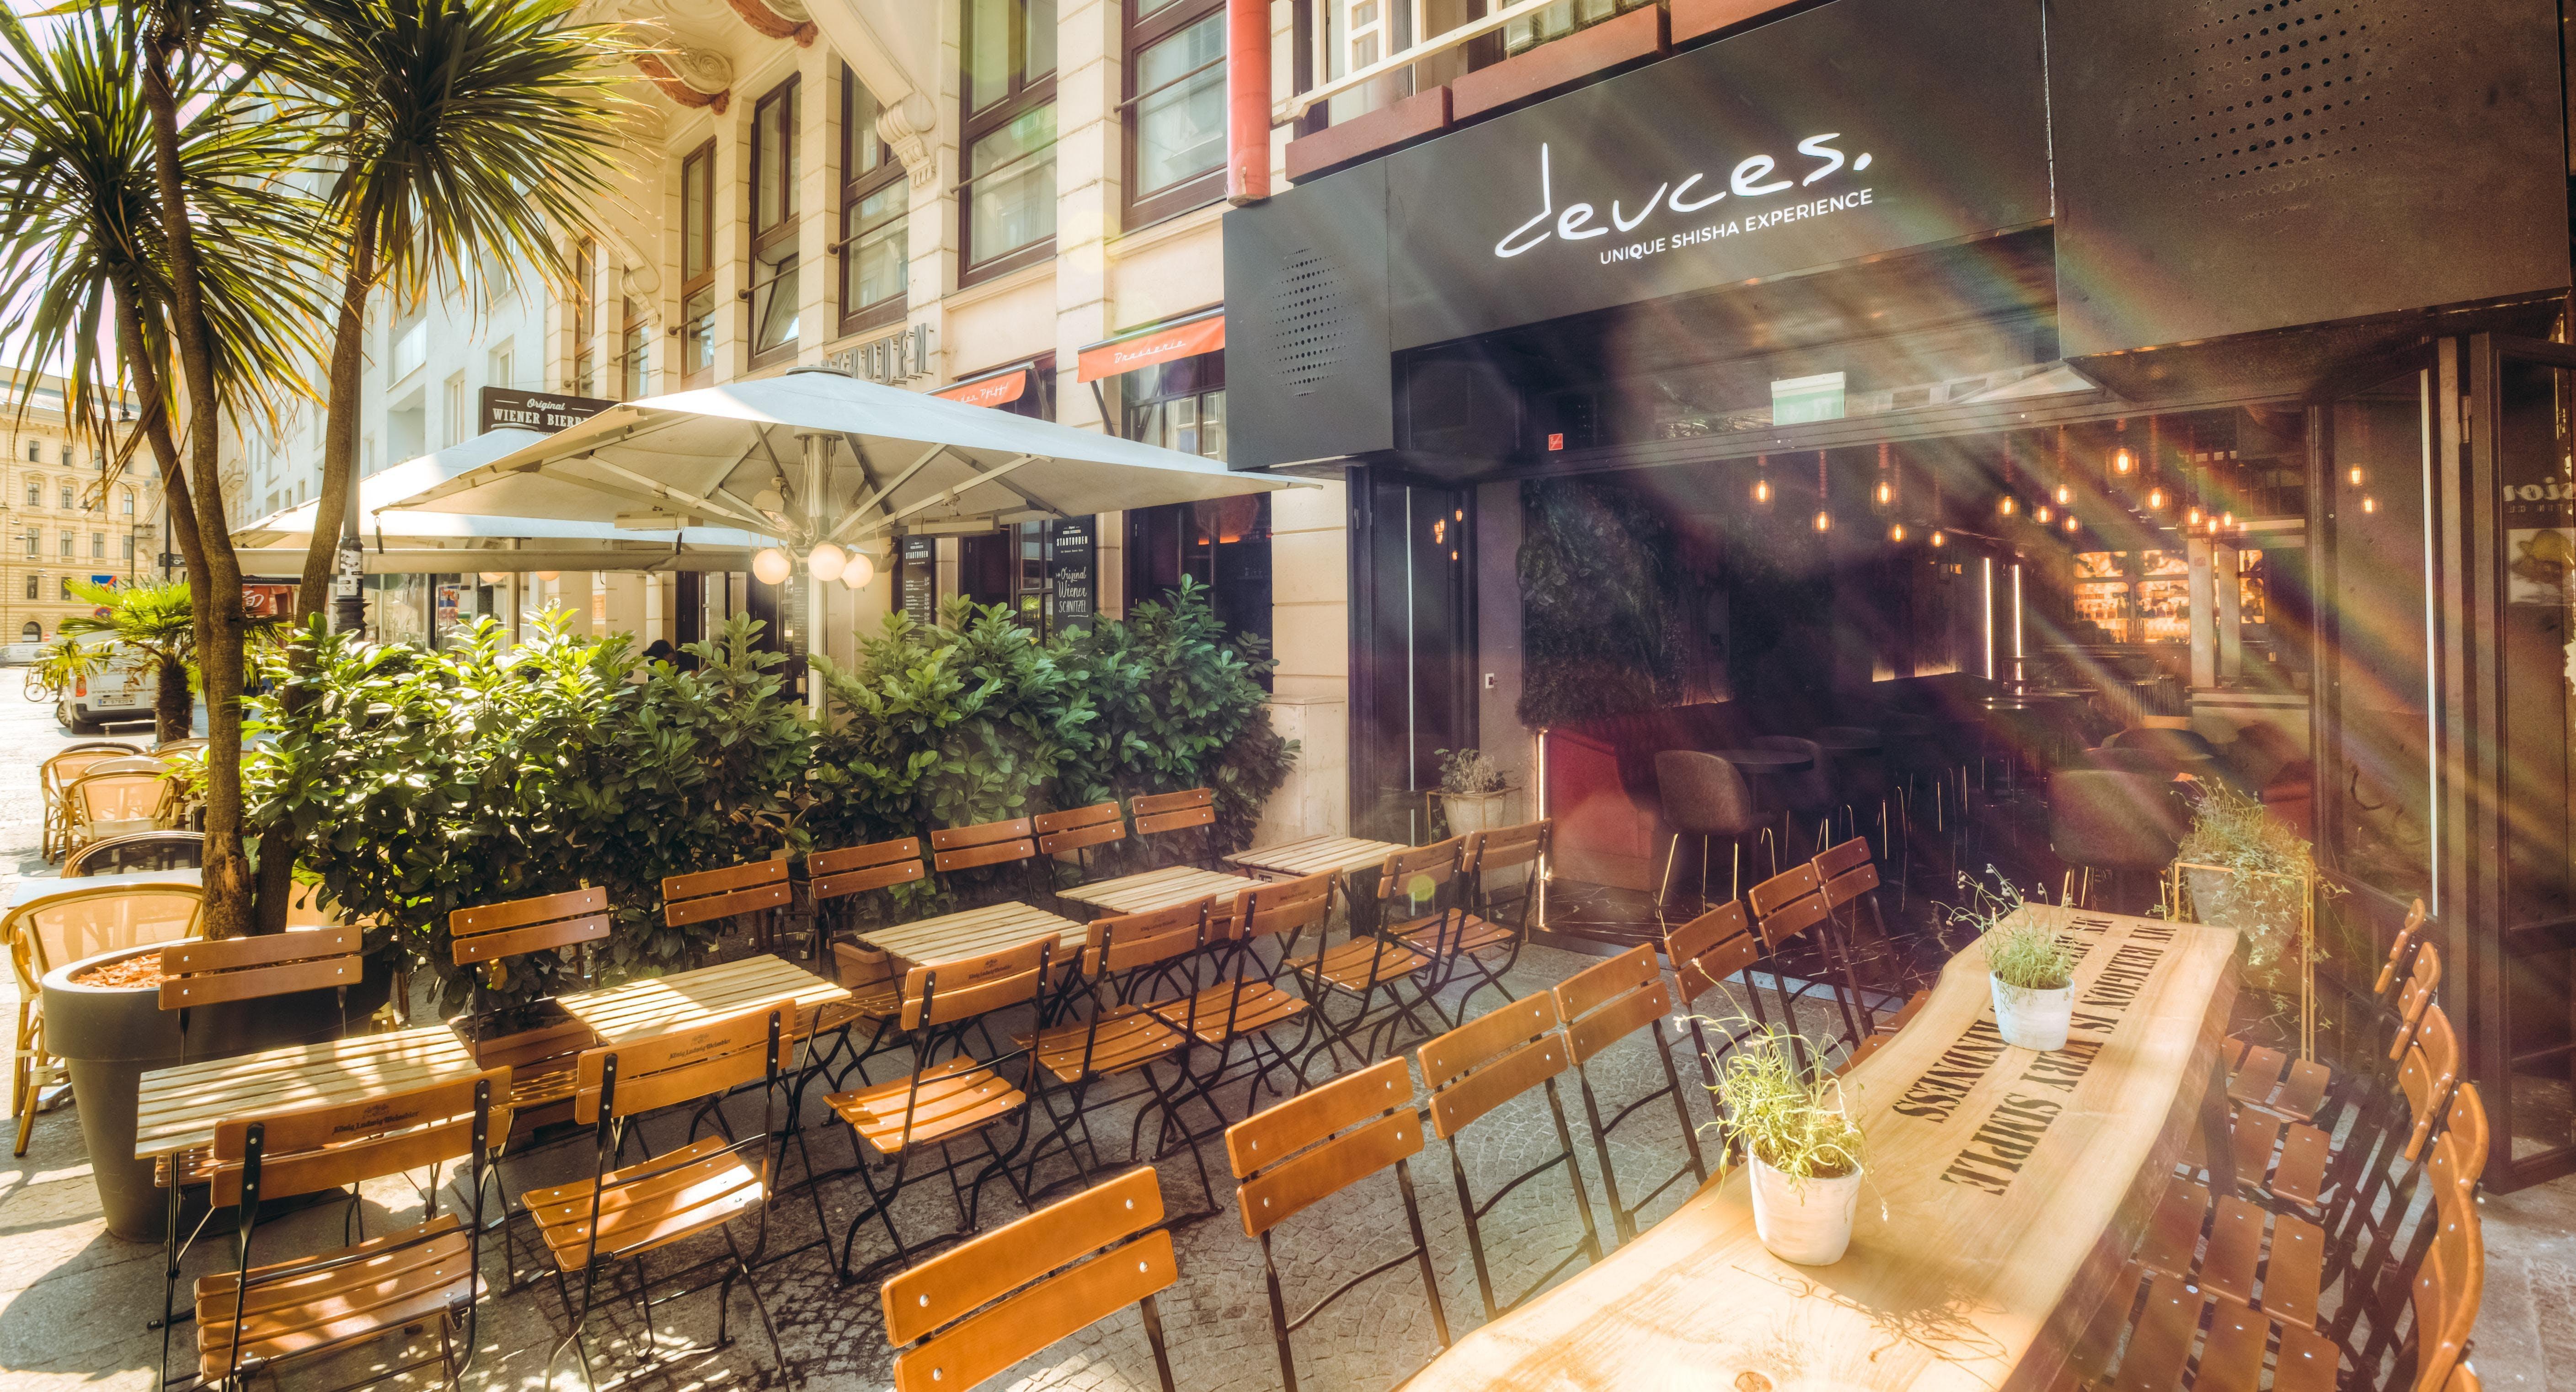 Deuces Shisha Lounge Vienna image 1